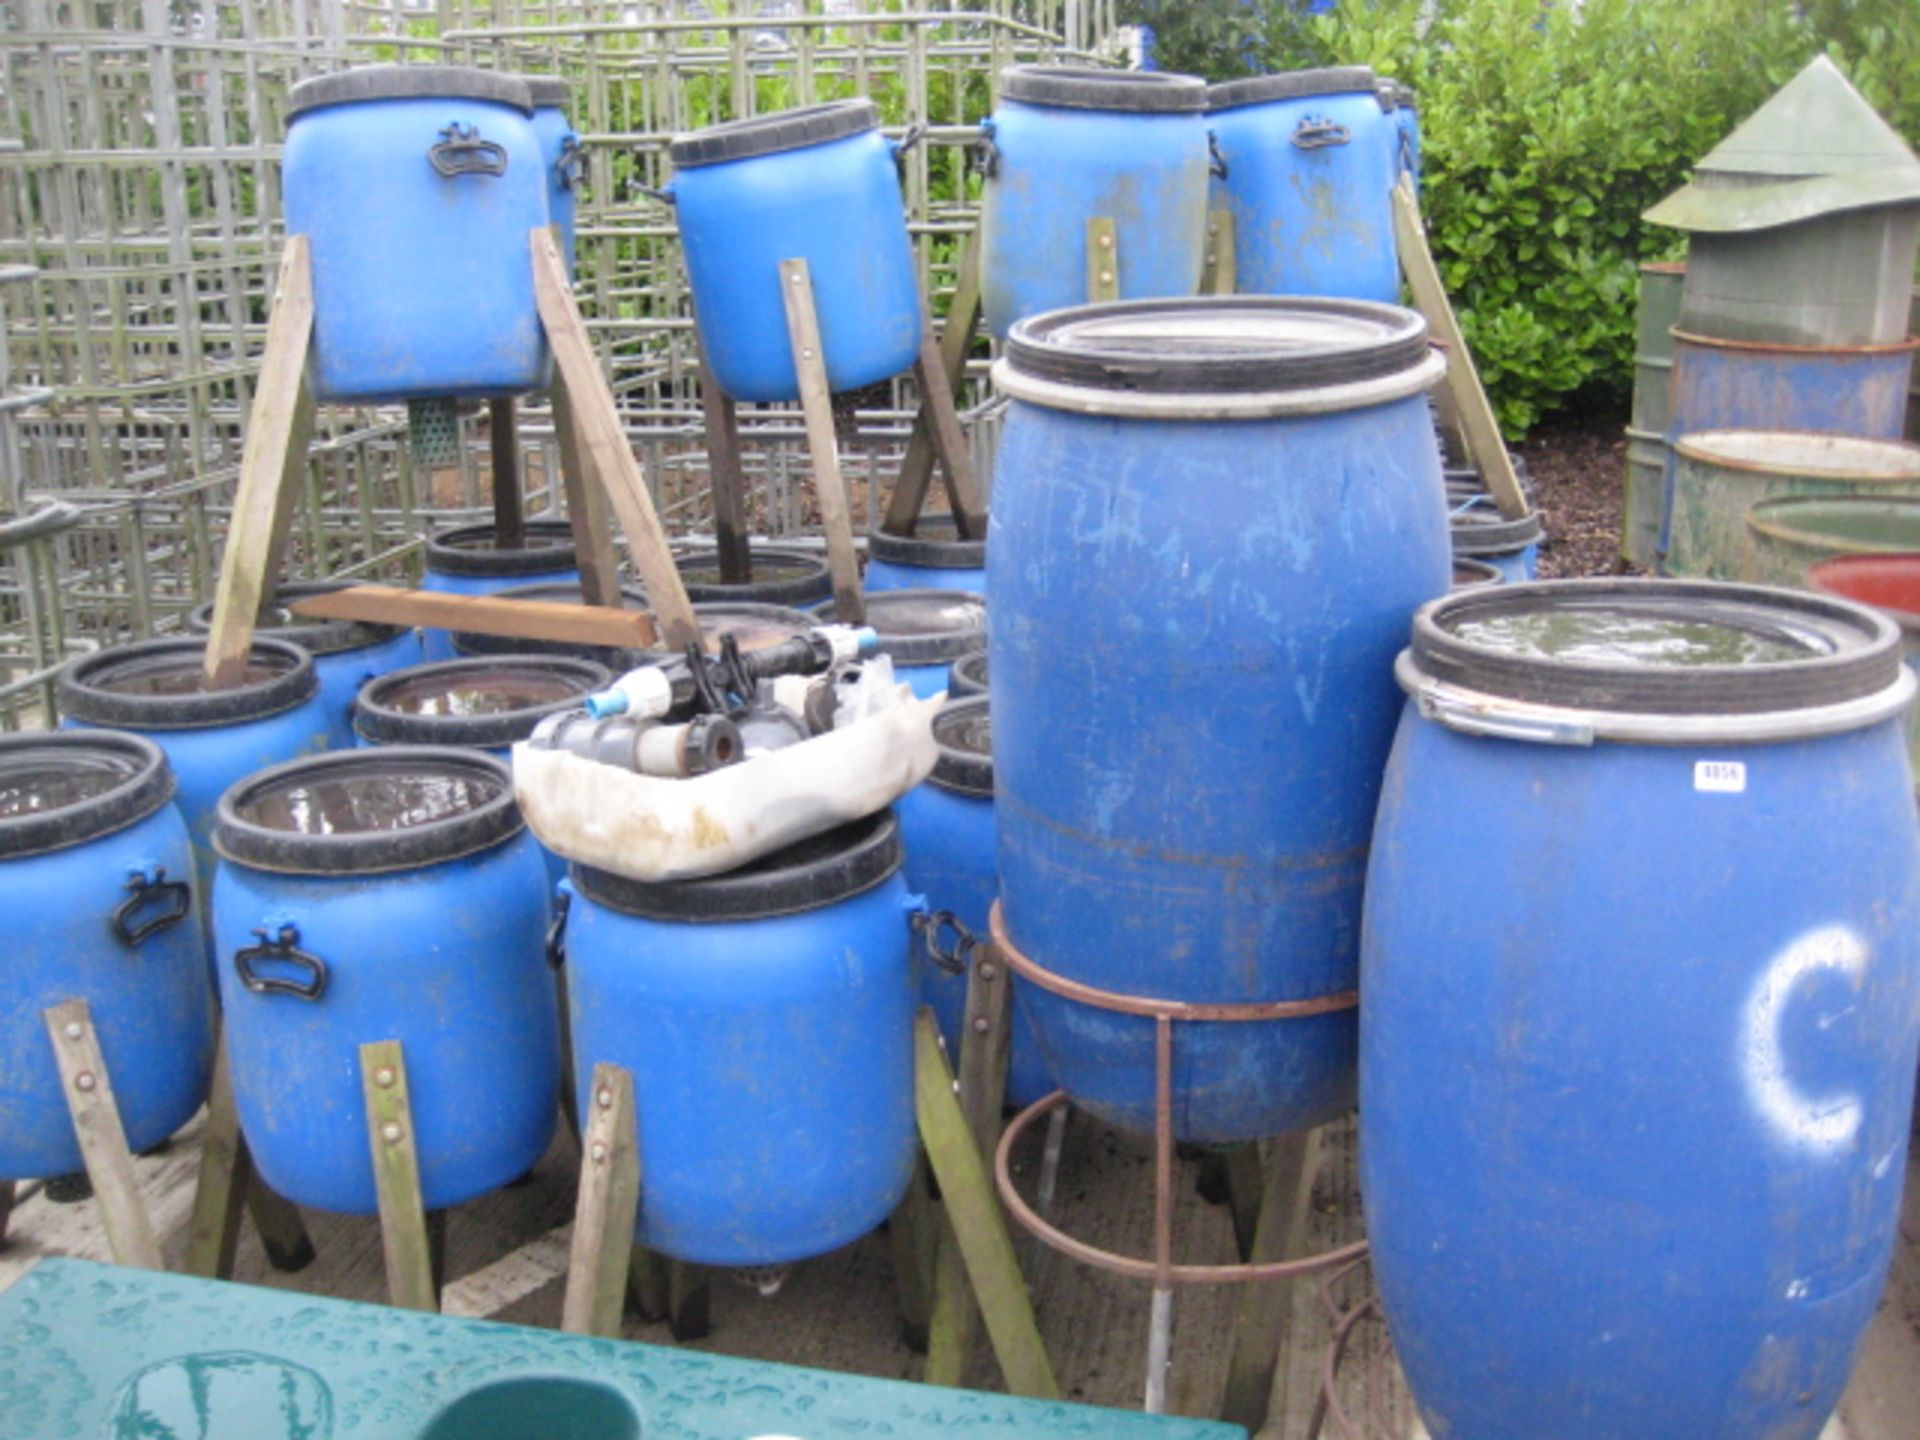 Lot 4056 - Large quantity of plastic Pheasant feeders on tripod legs